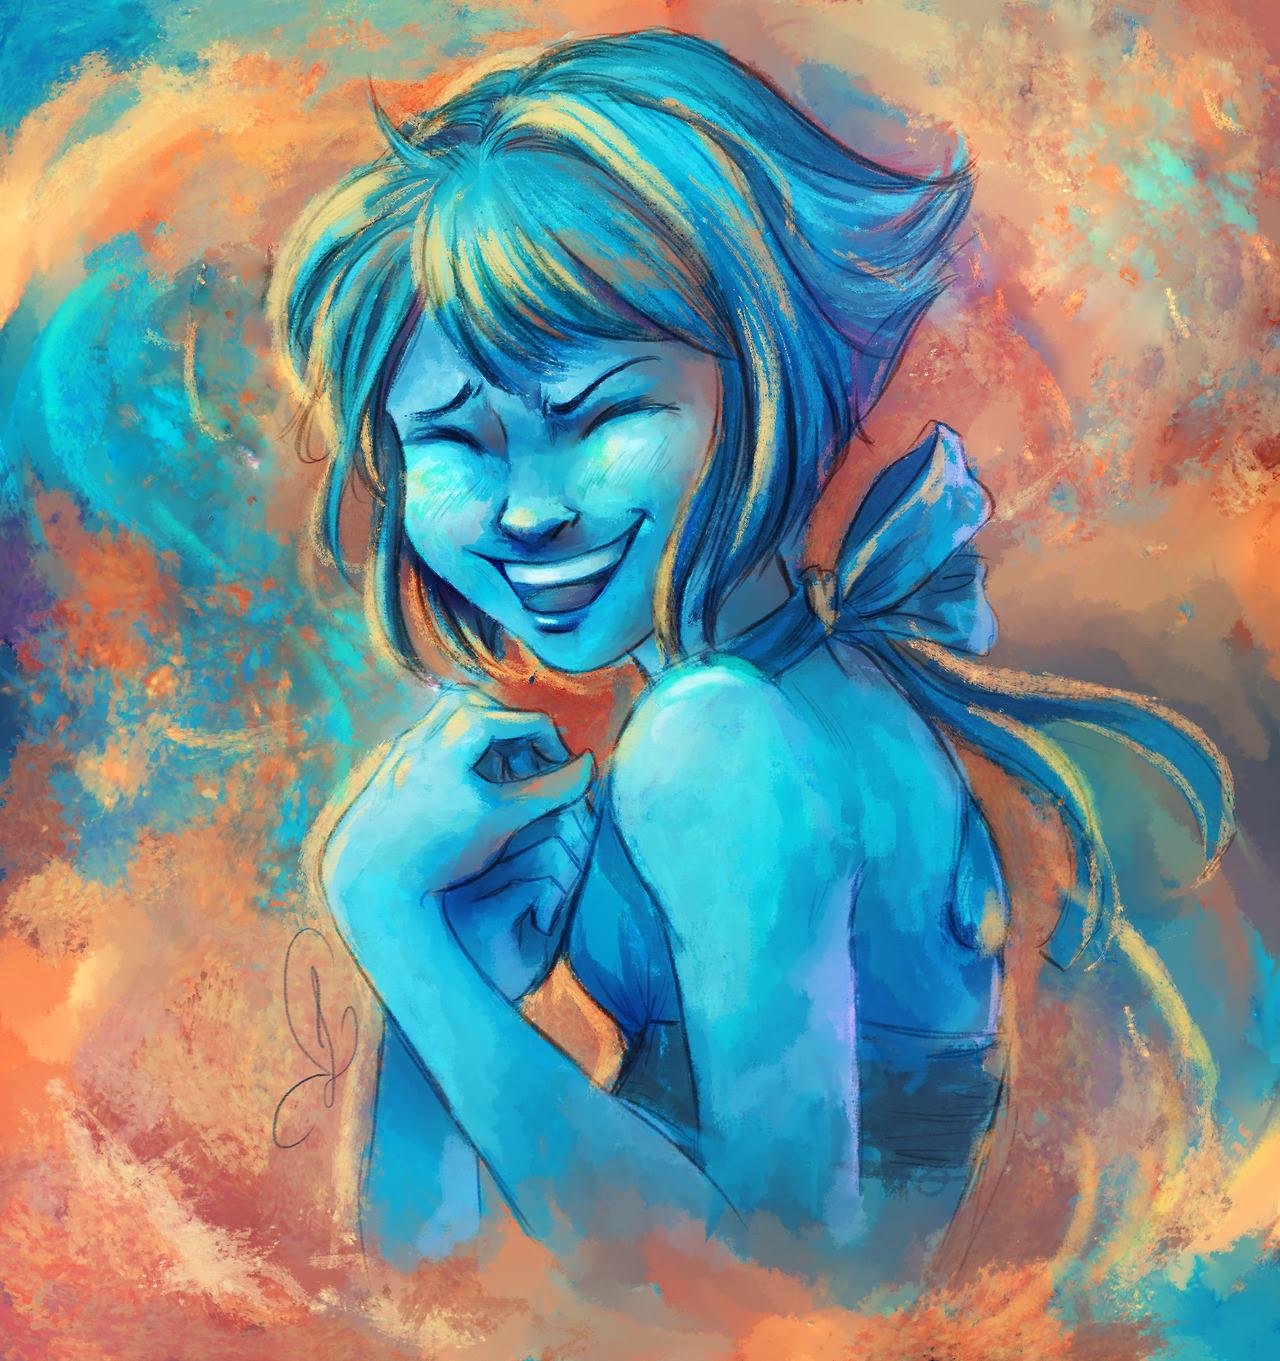 We need more smiling Lapis